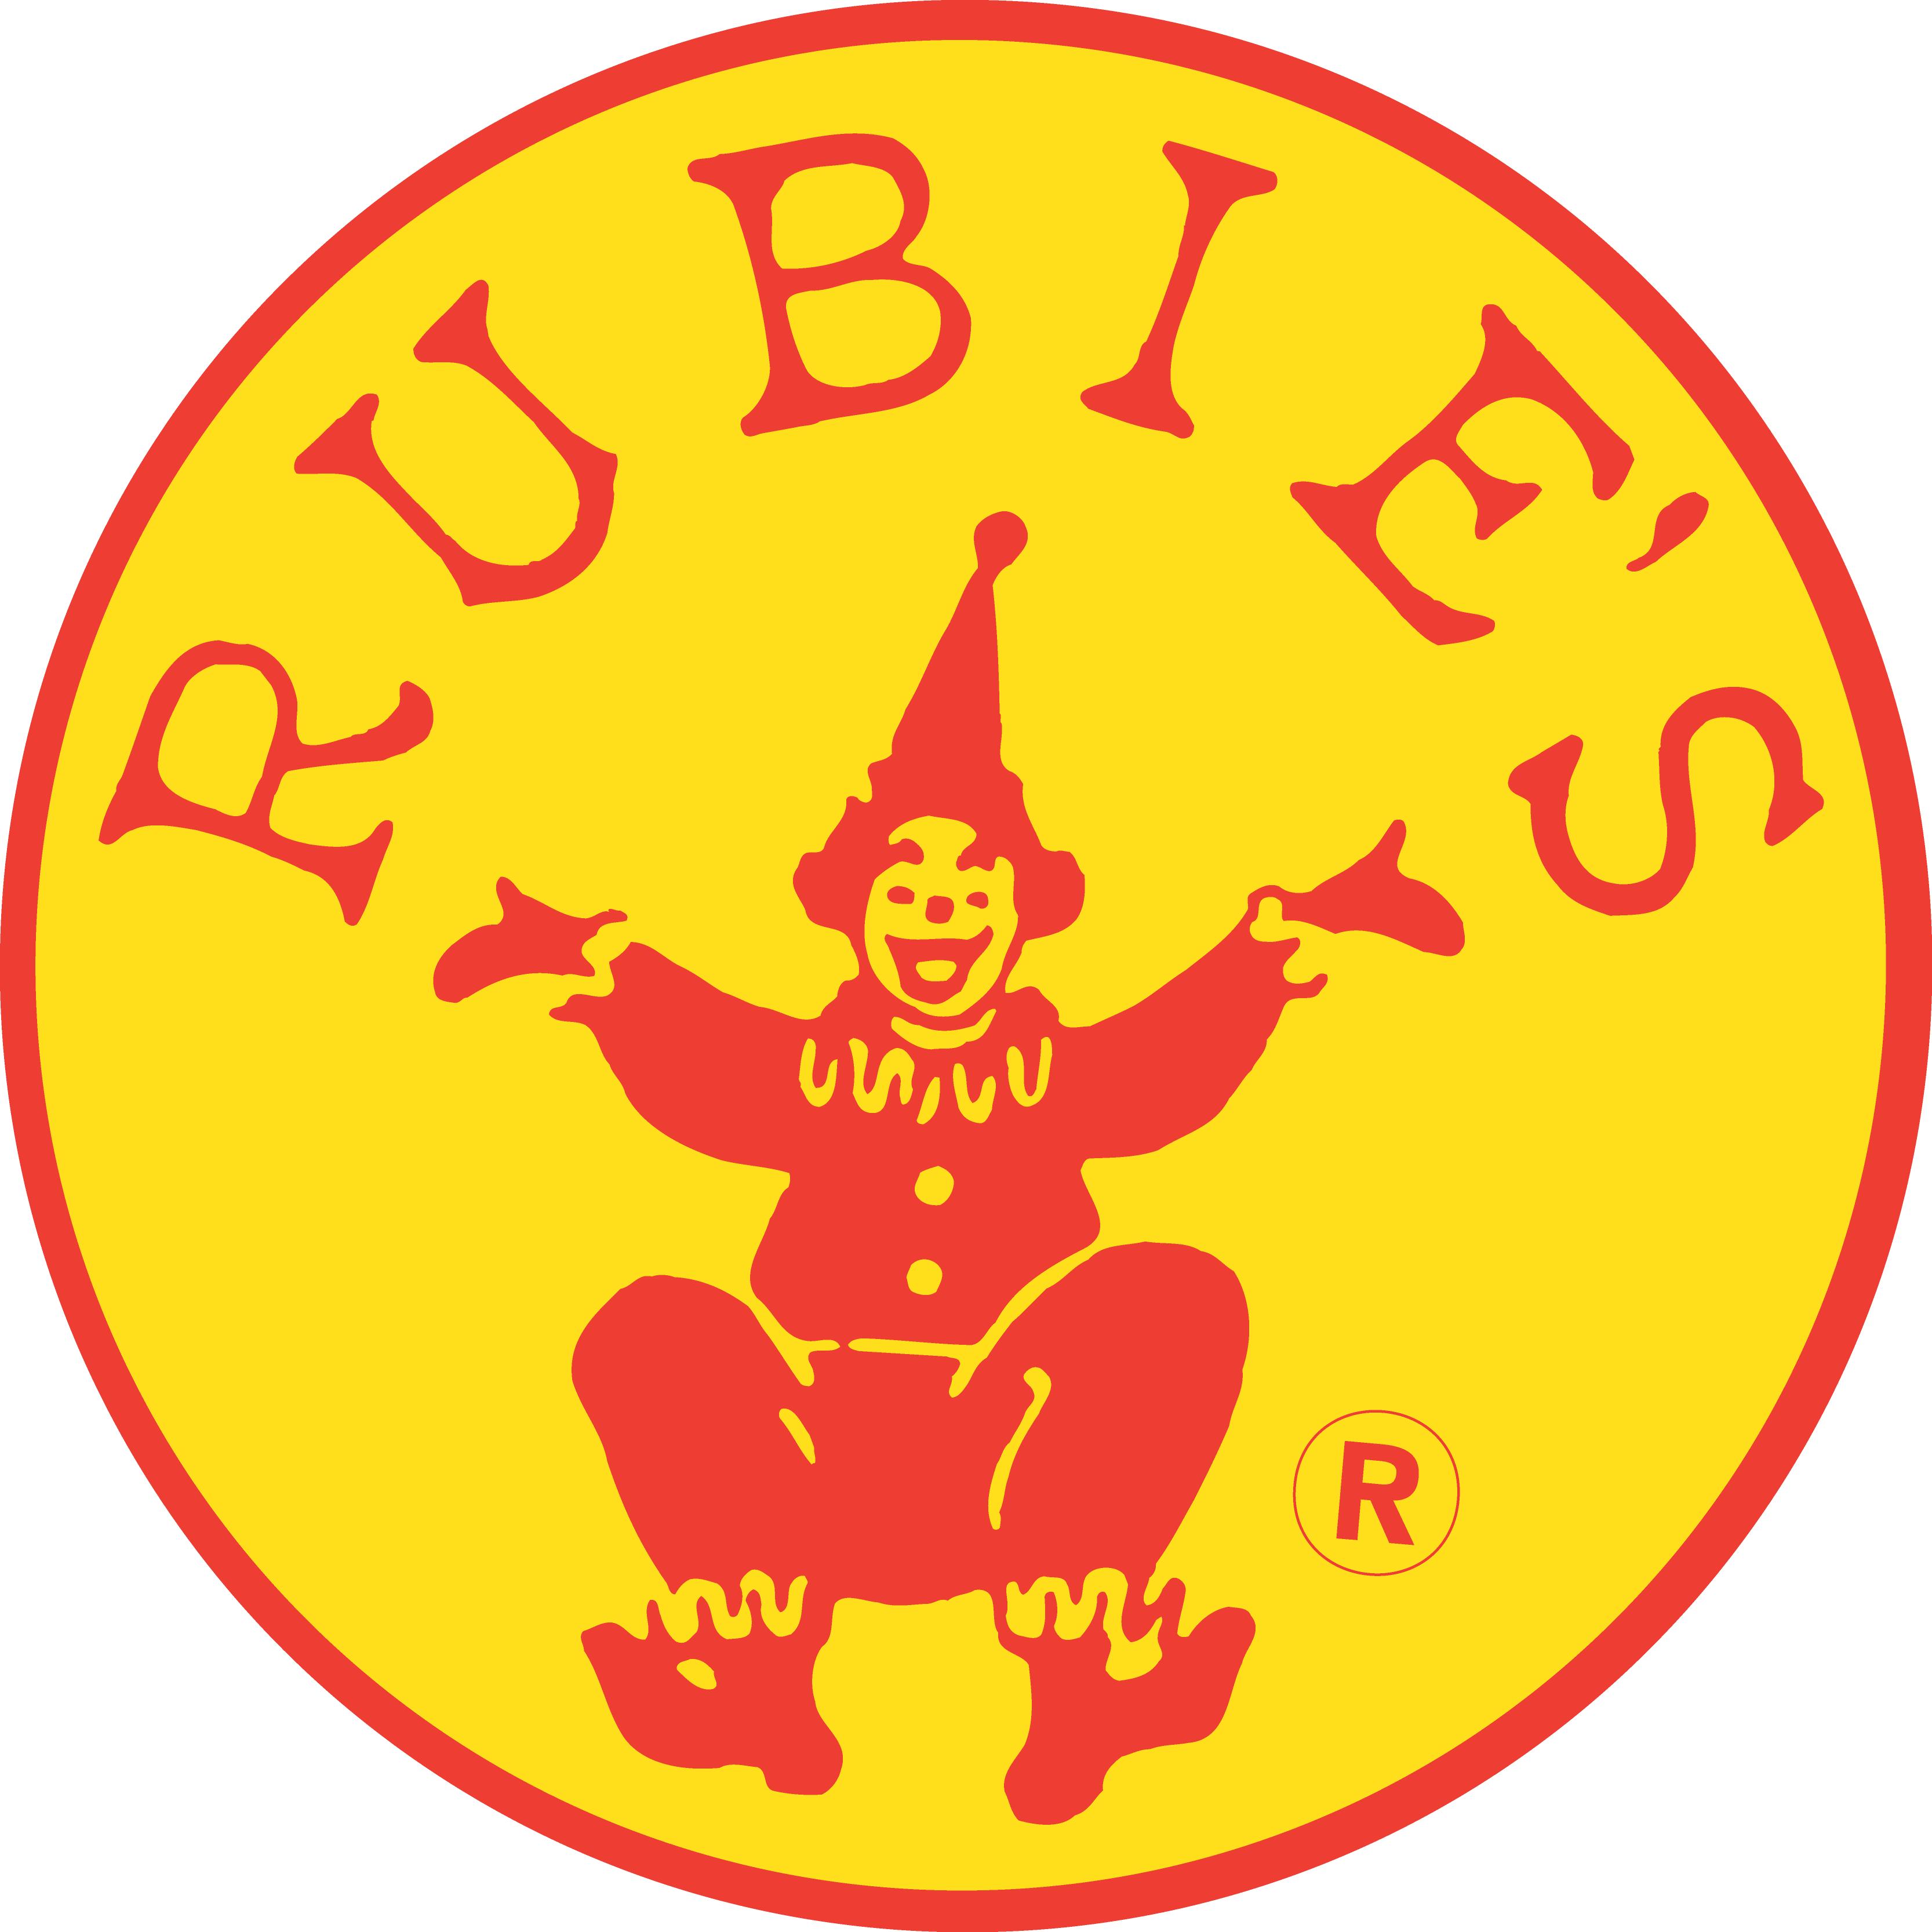 Rubie's Costume Company - Westbury Flagship Store